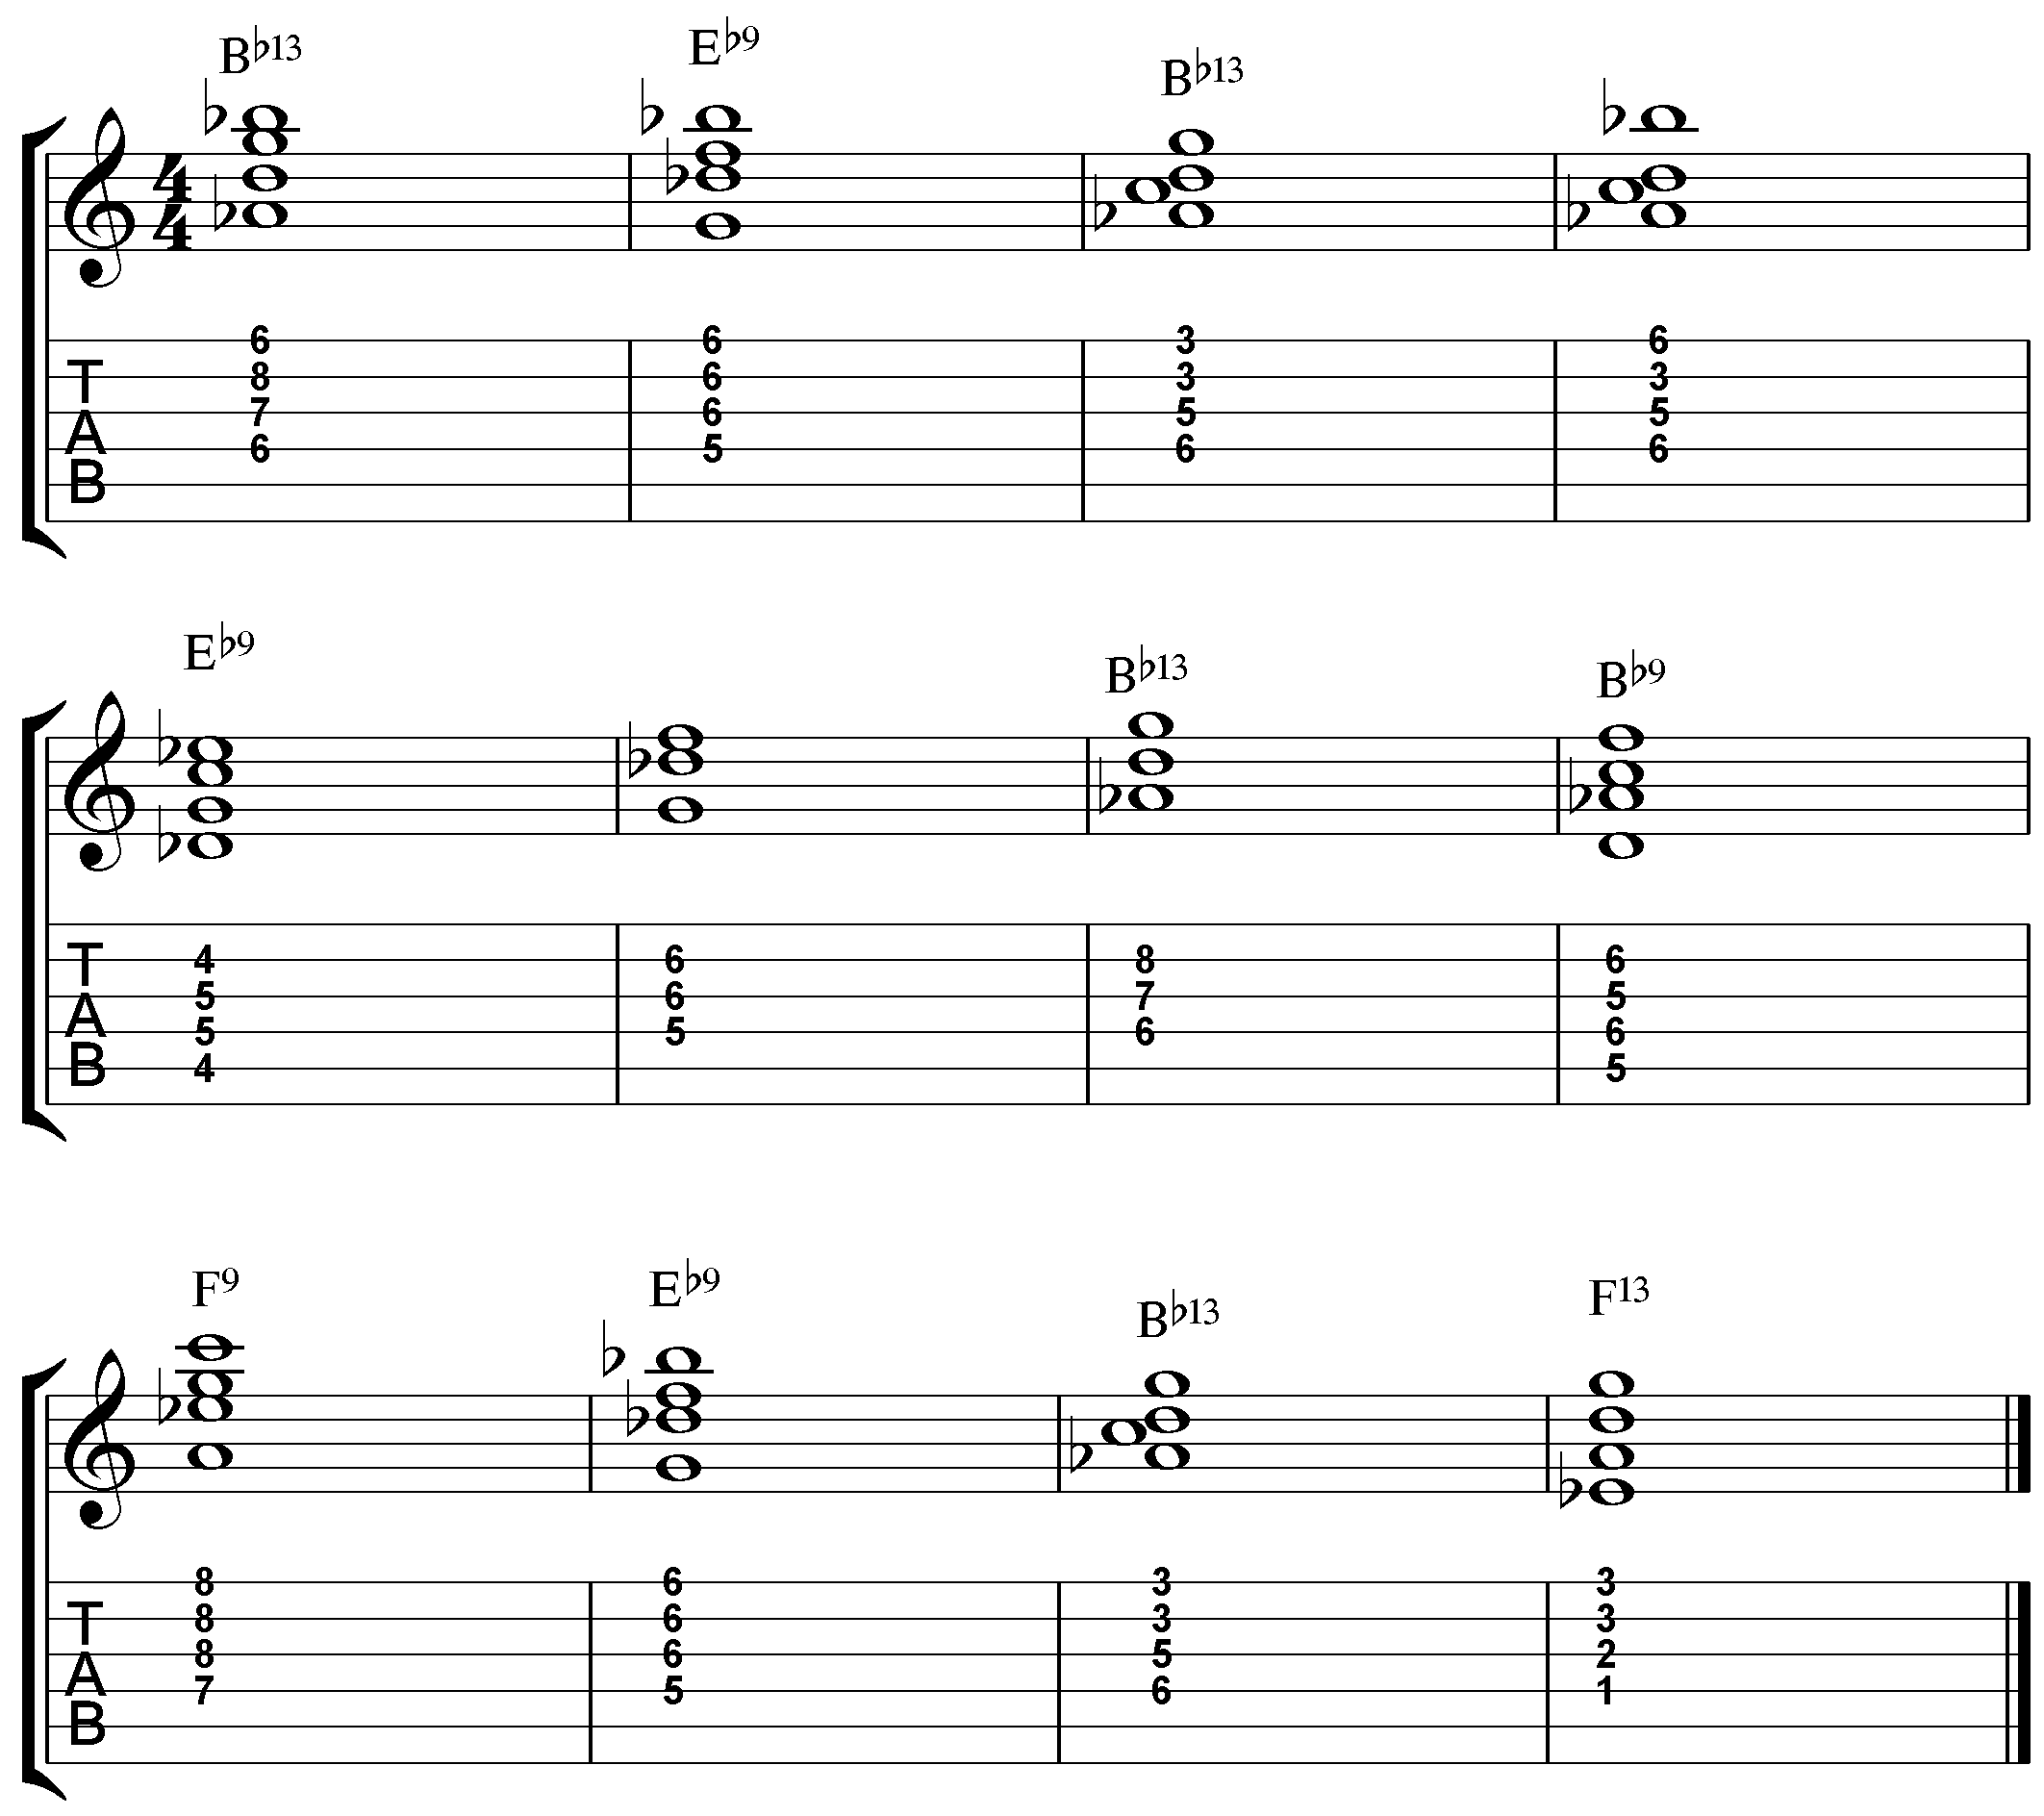 guitar chord inversions chart pdf